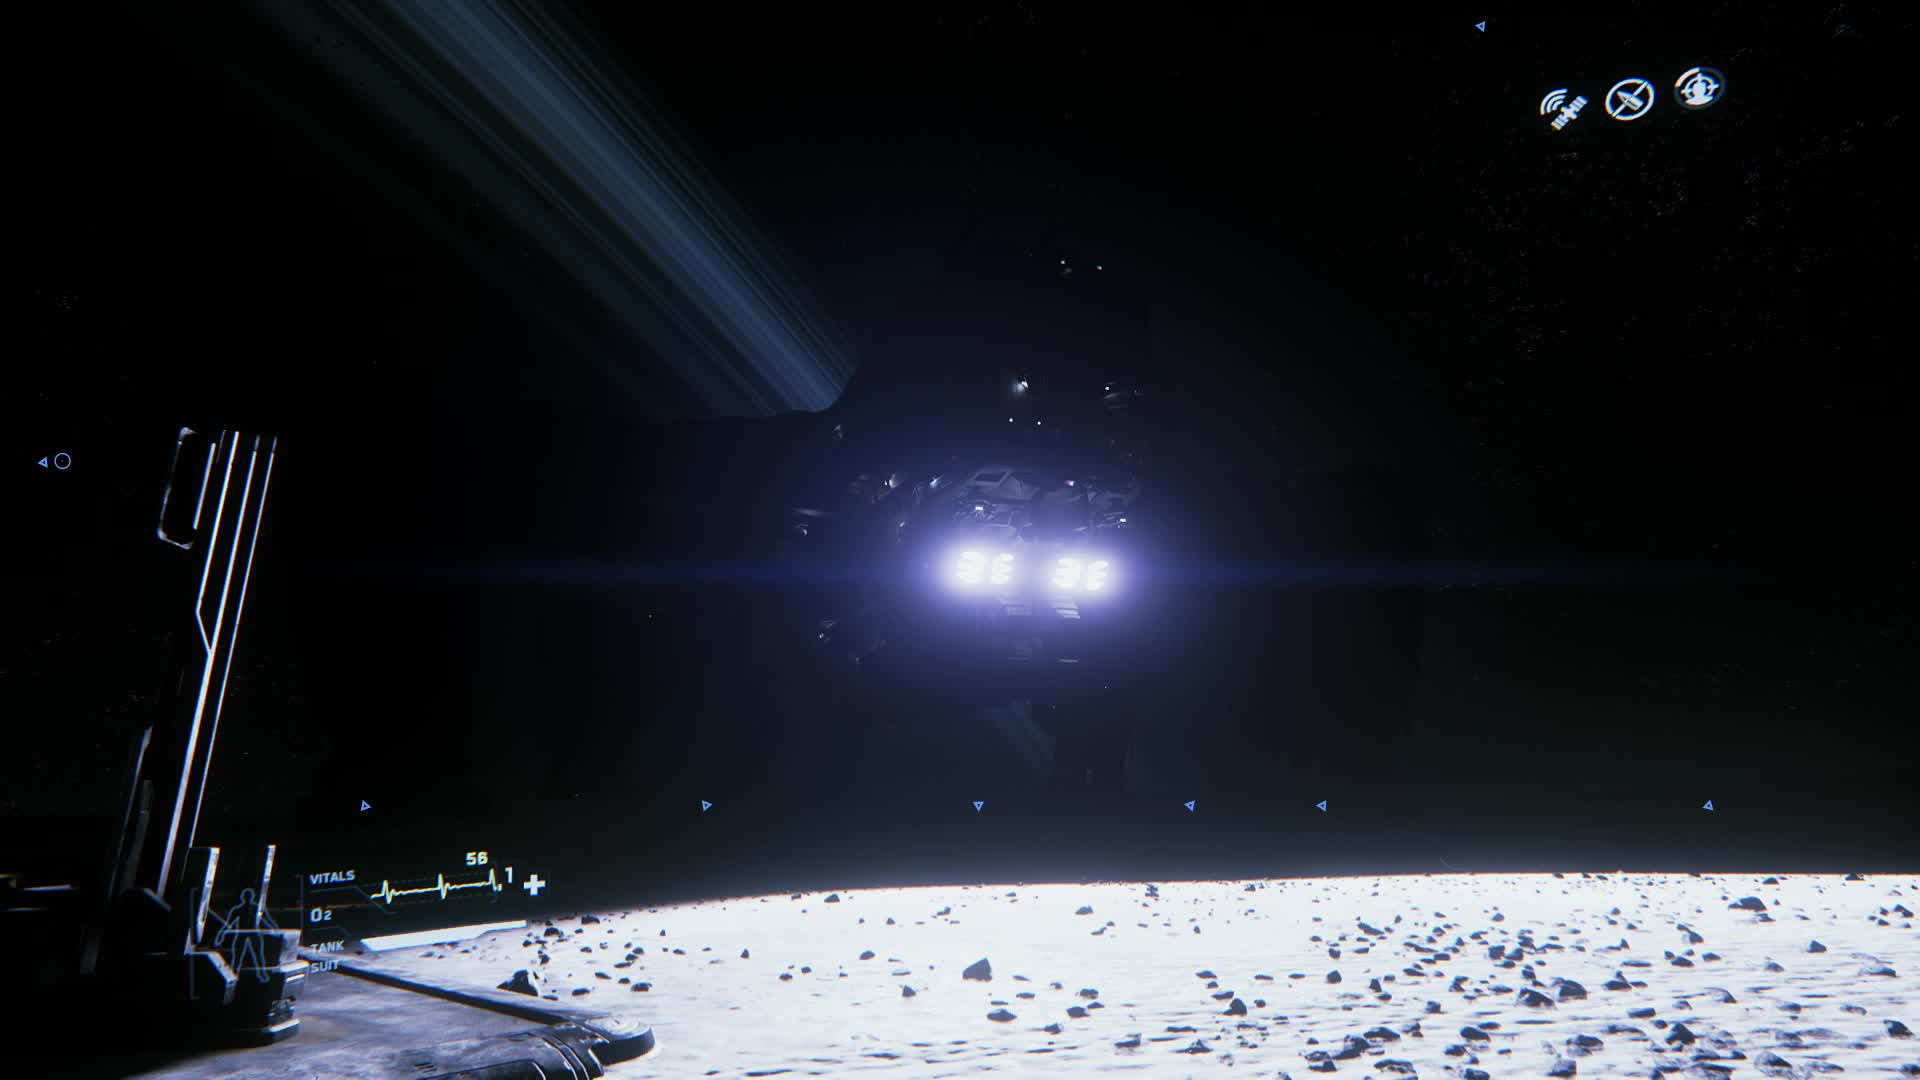 starcitizen, Star Citizen - Reclaimer GIFs